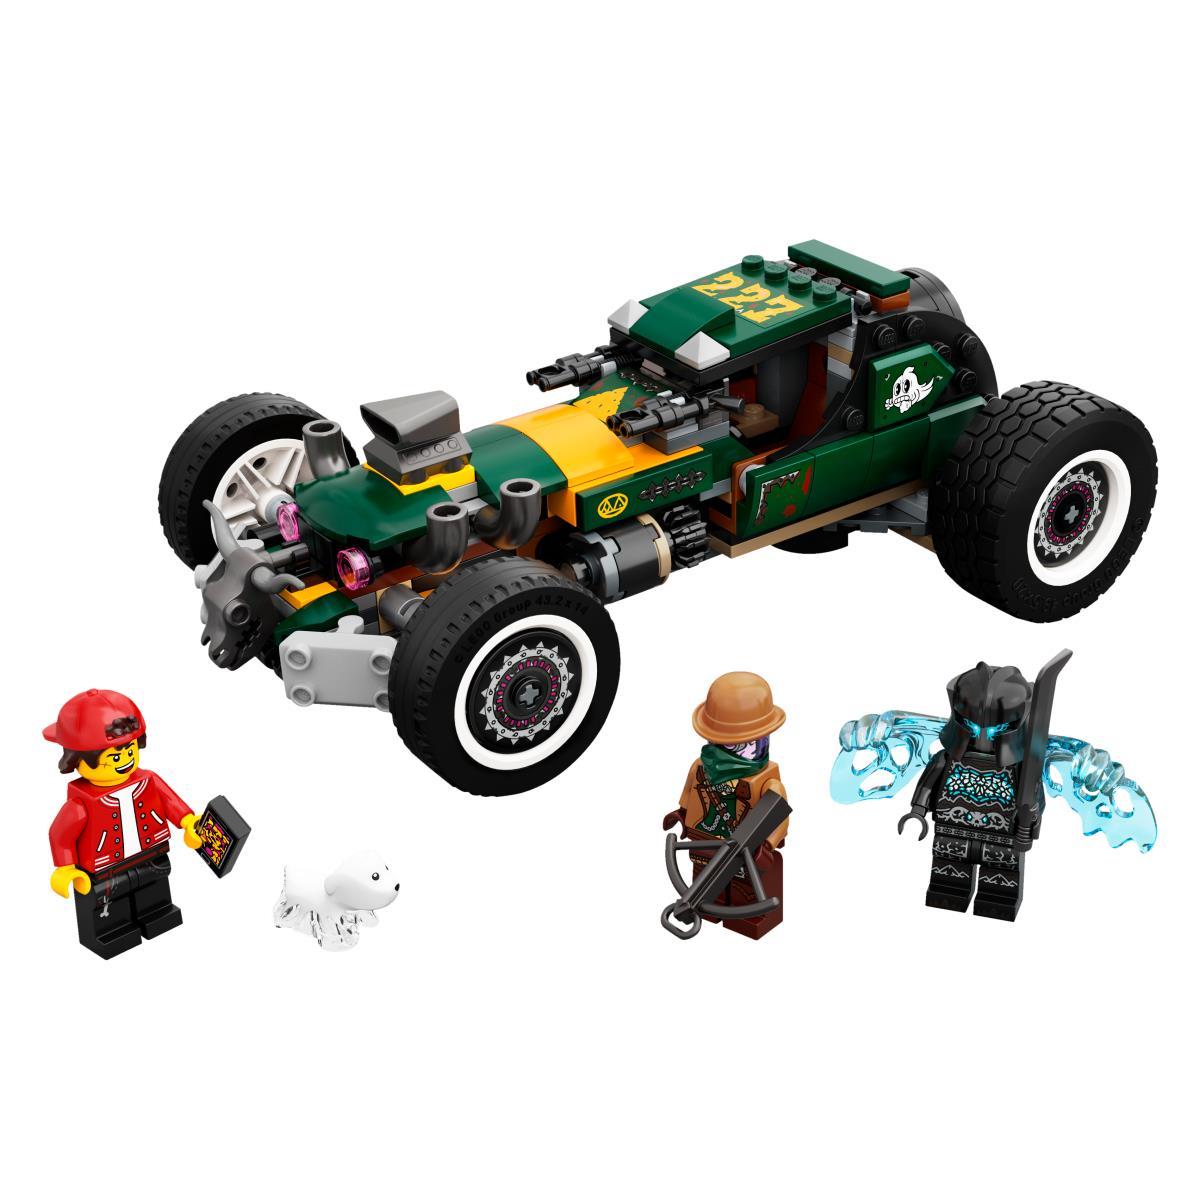 lego-hidden-side-70434-overnaturlig-racerbil (1)